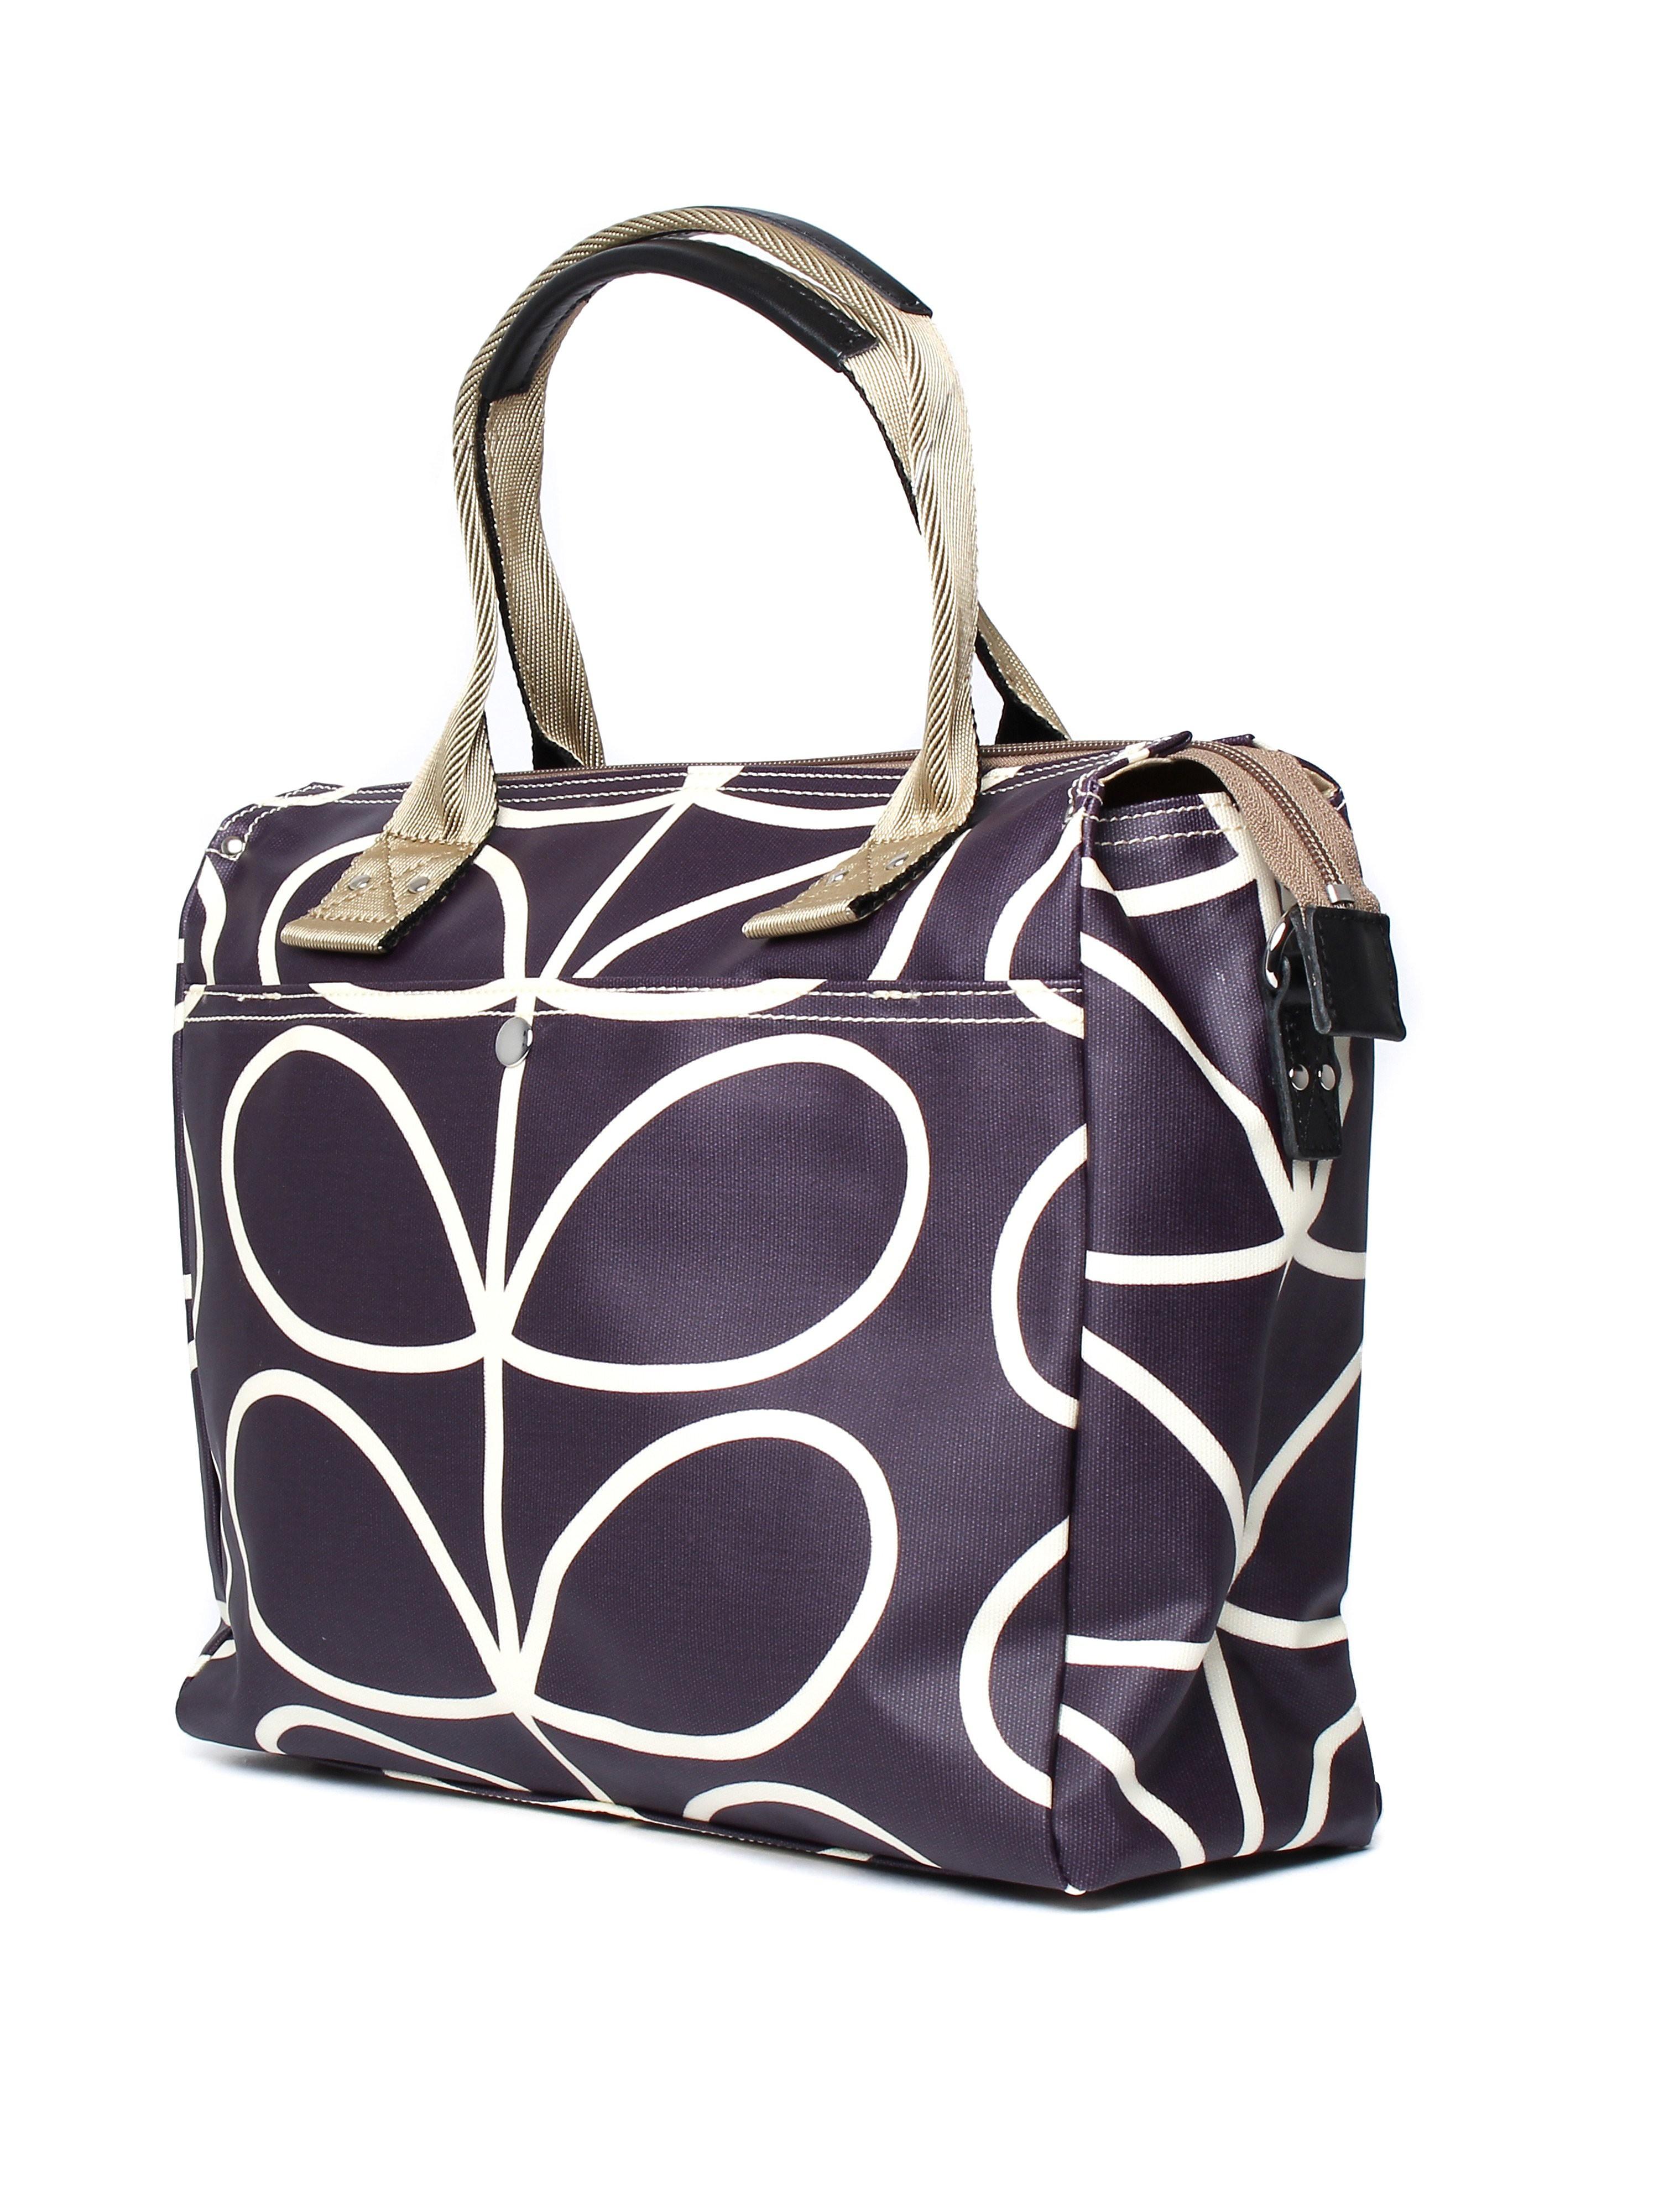 Orla Kiely Women's Zip Messenger Bag - Orchid